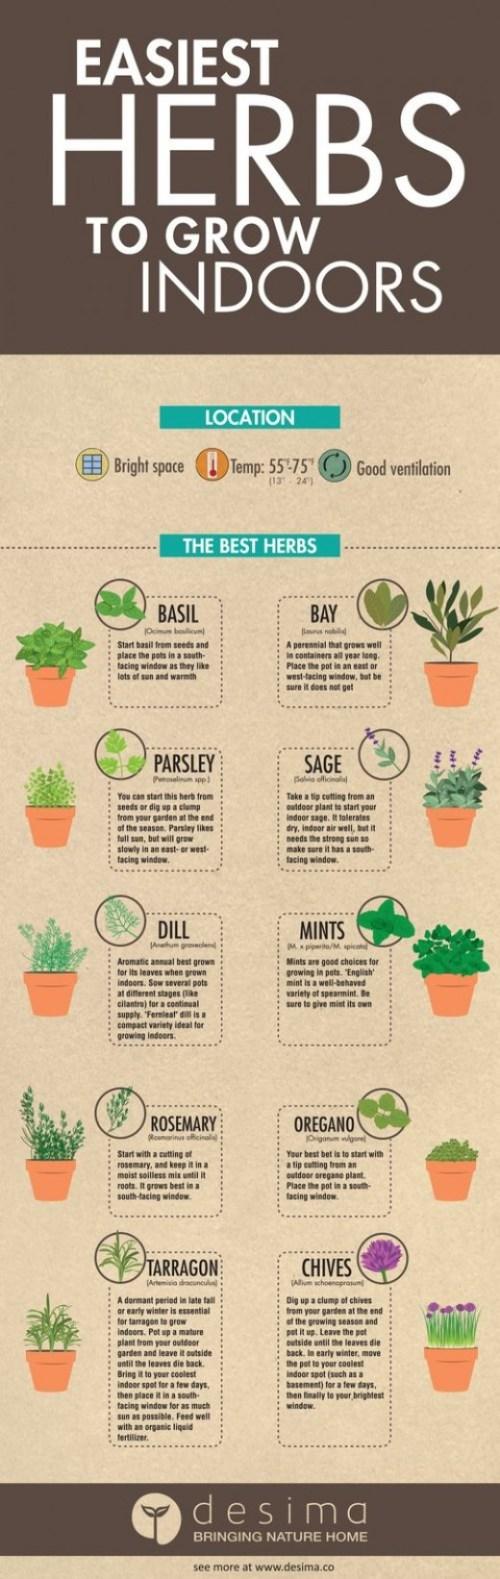 Fashionable A Pallet Diy Herb Garden Pallet Vertical Gardening Diy Craft Making An Herb Garden Out Diy Herb Garden Ideas